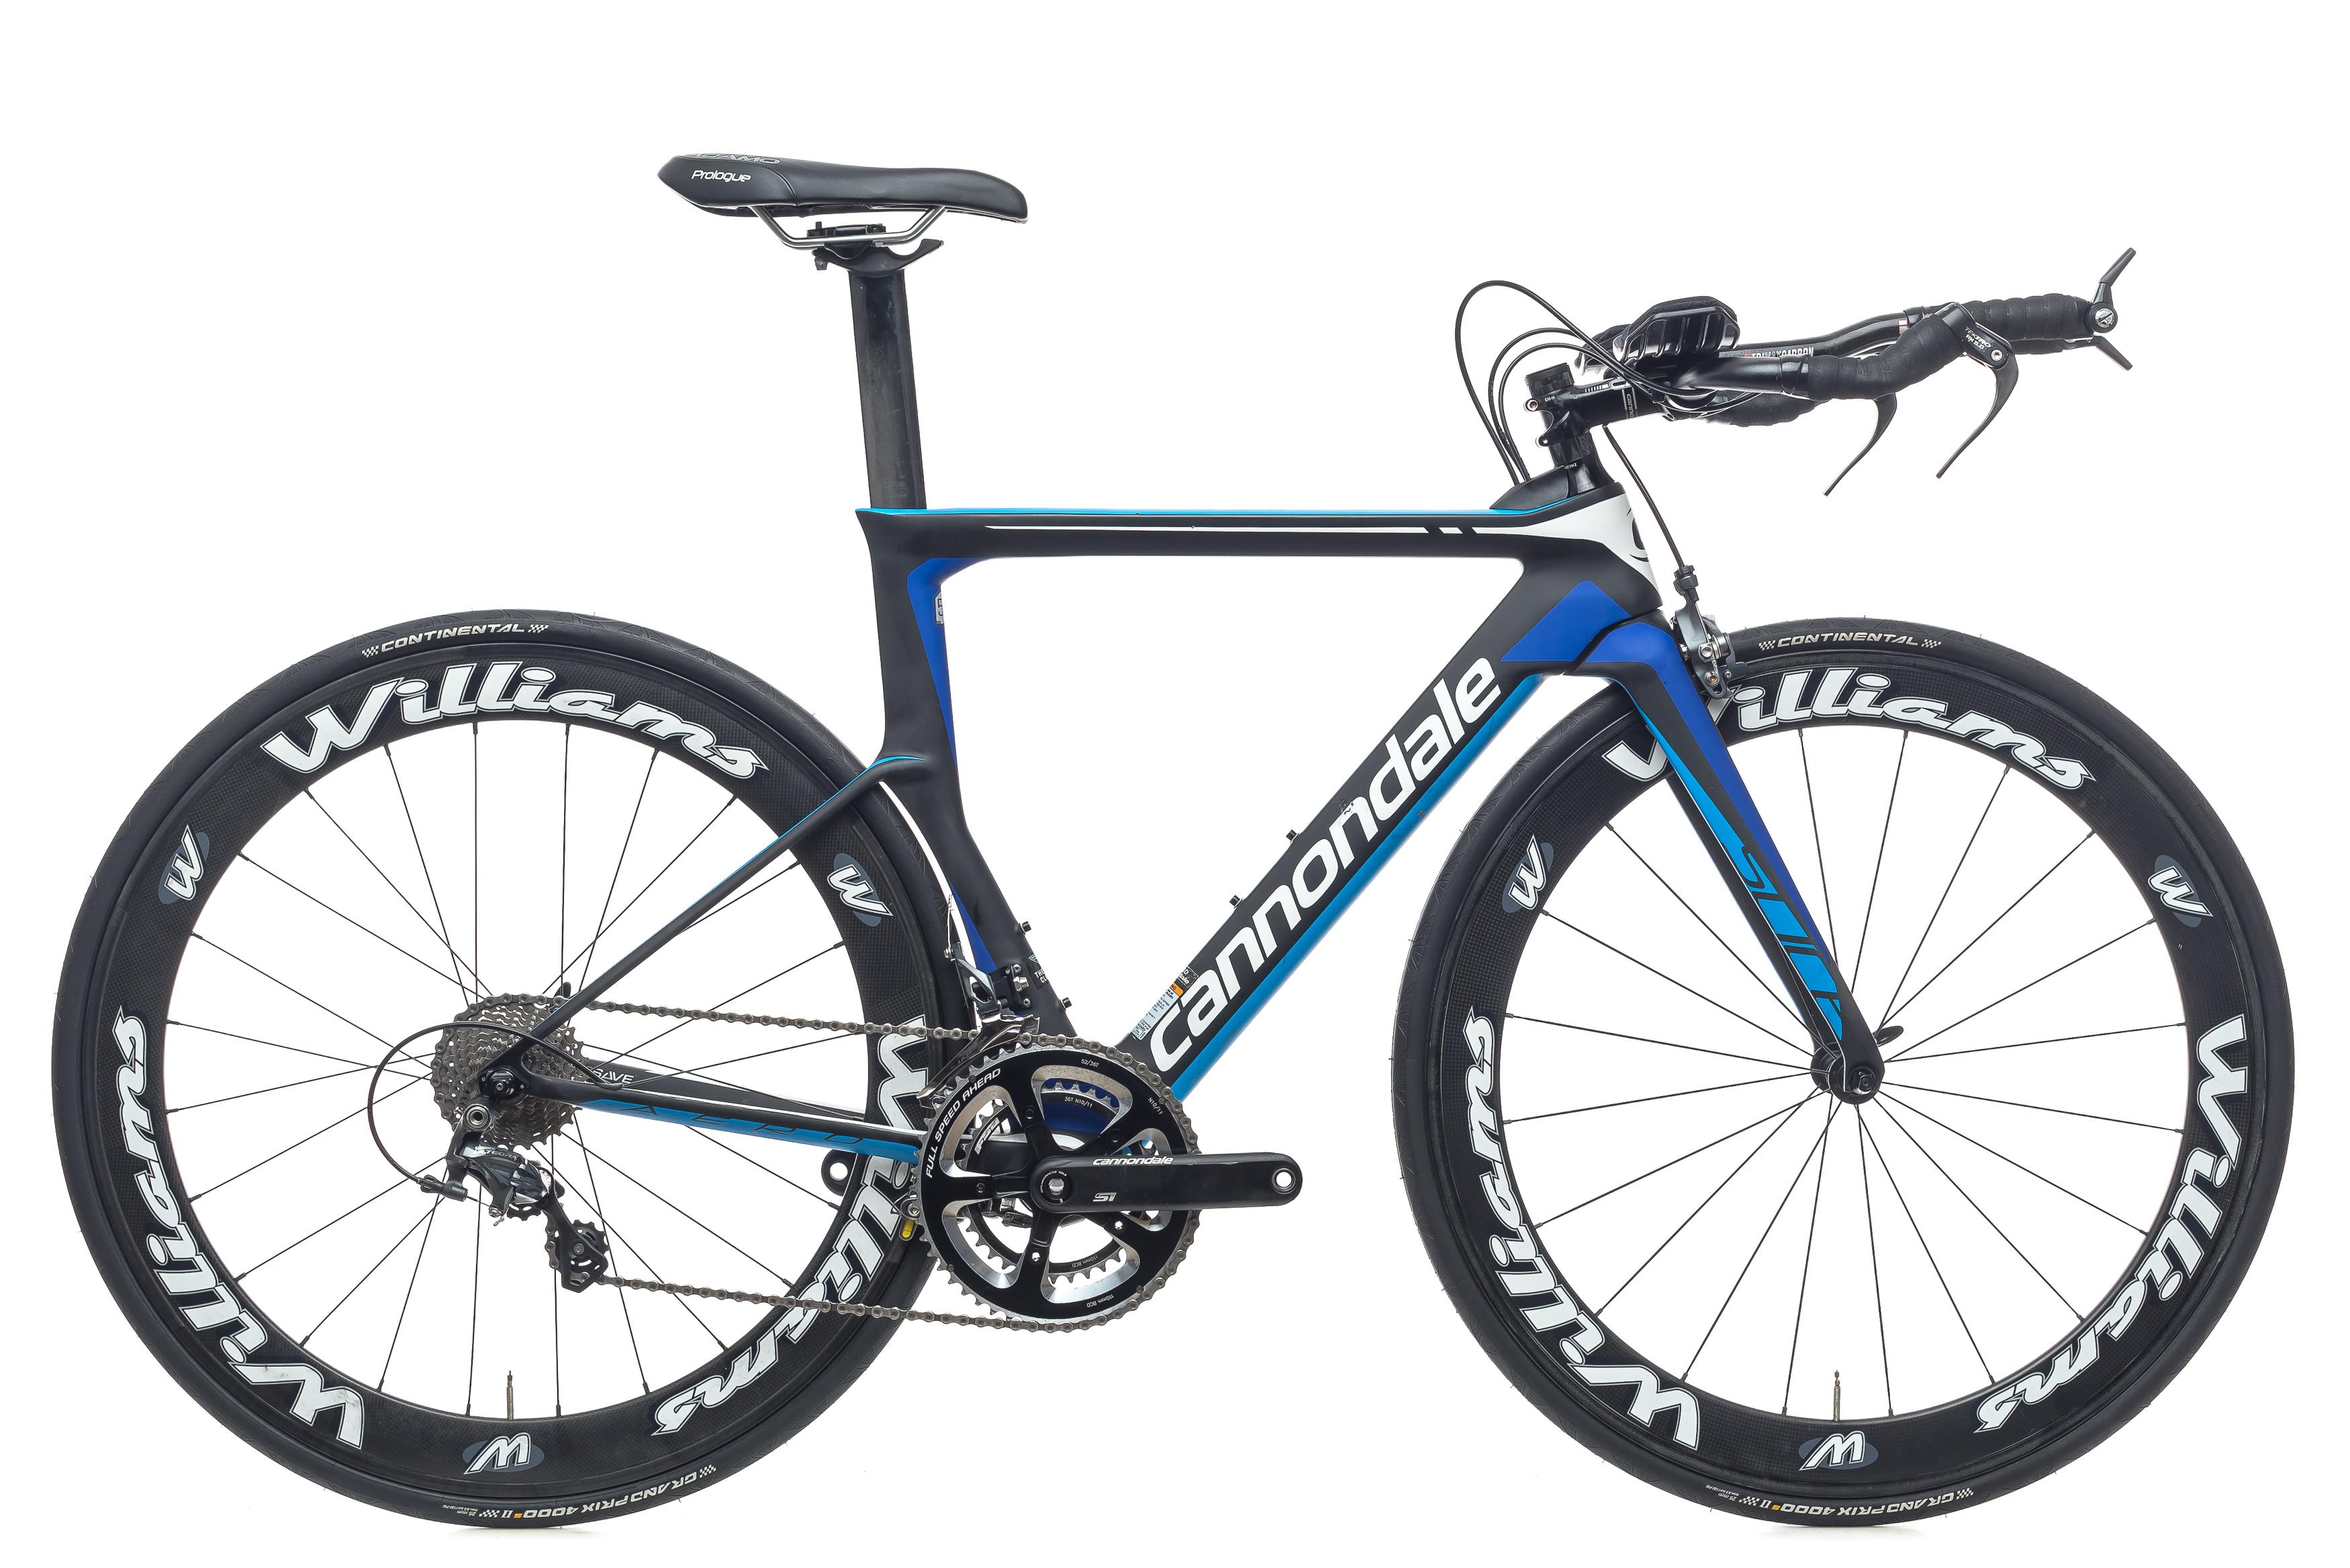 a66ef32cd43 2016 Cannondale Slice Ultegra TT Triathlon Bike 51cm Carbon Shimano 11s  Williams